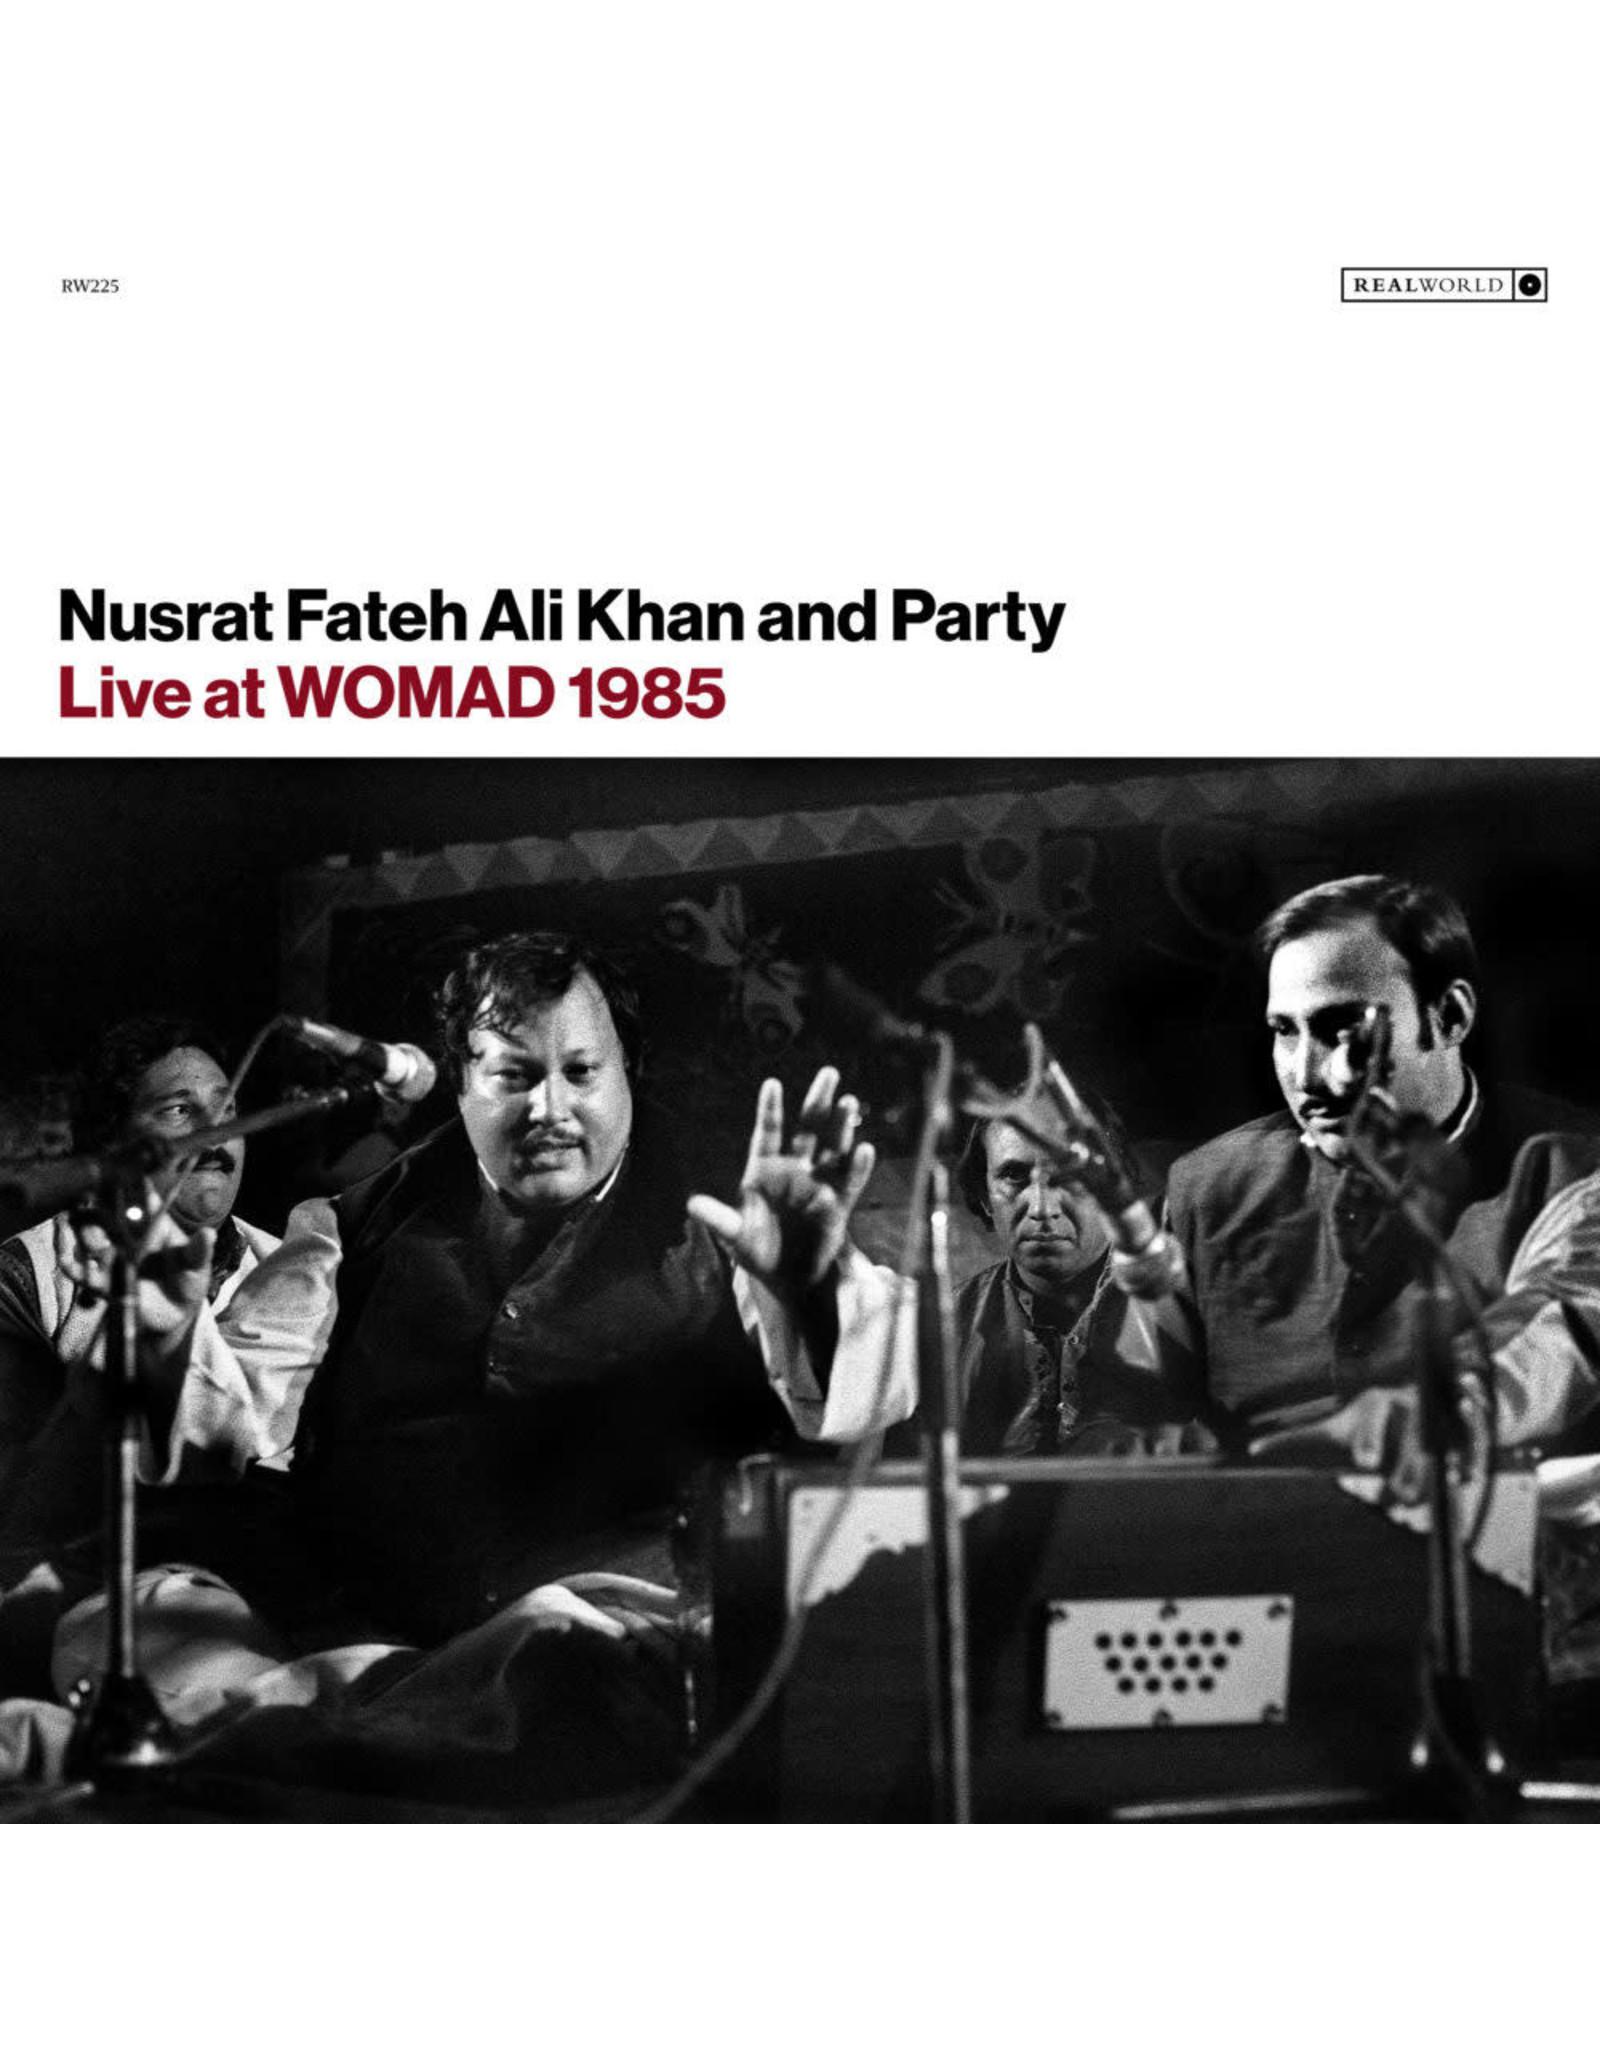 Khan, Nusrat Fateh Ali - Live at WOMAD 1985 LP